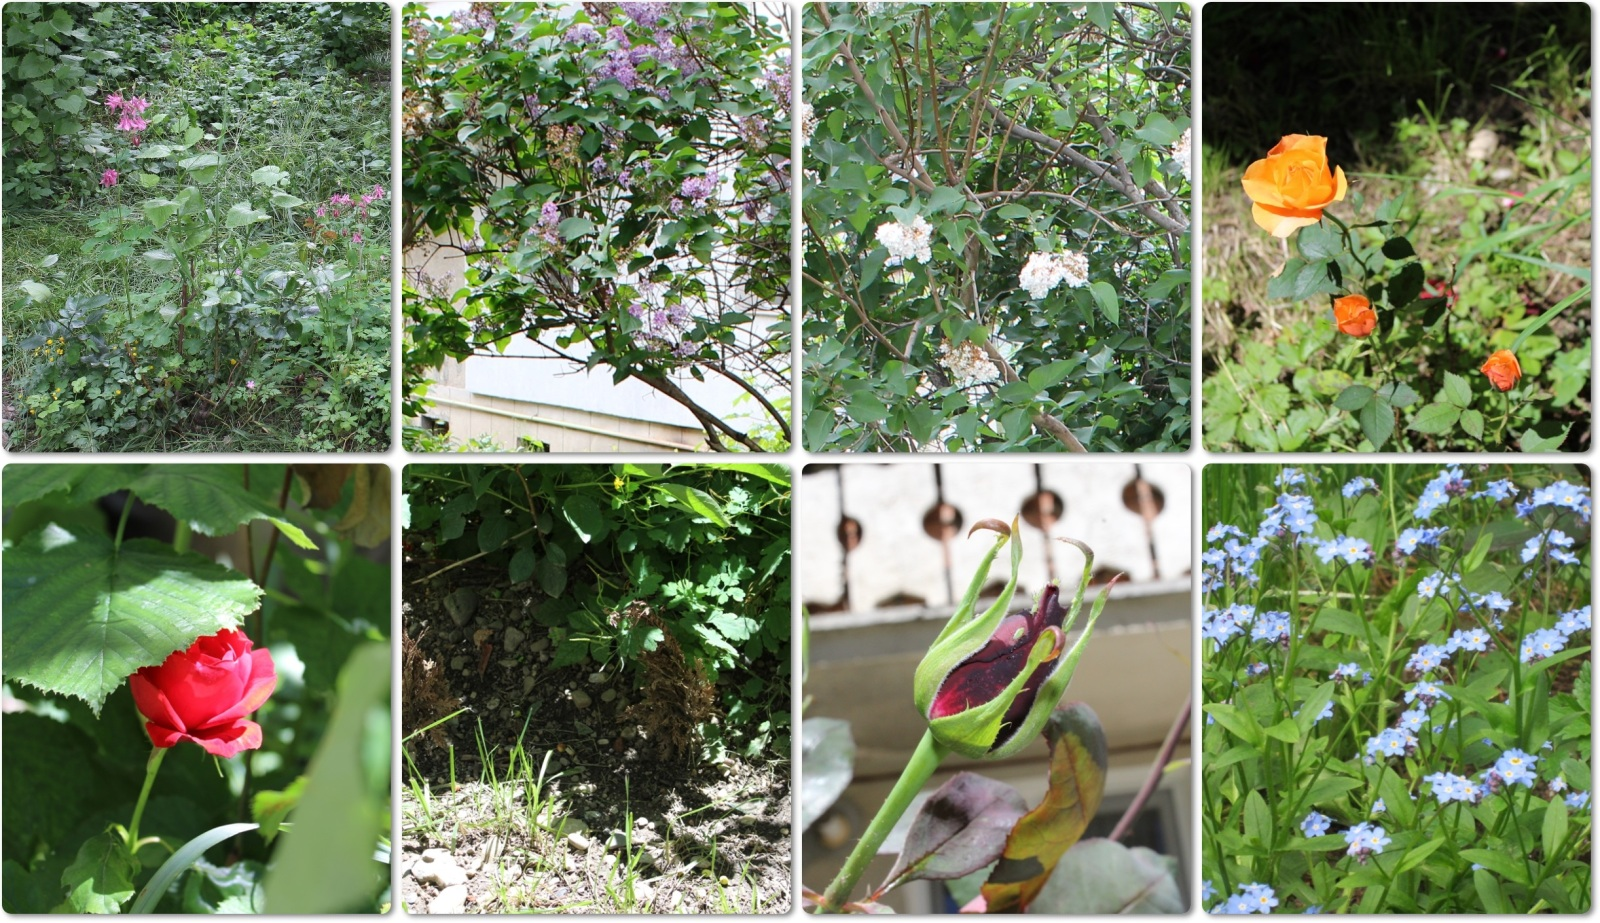 Flori si gradini - Pagina 31 25spkyu